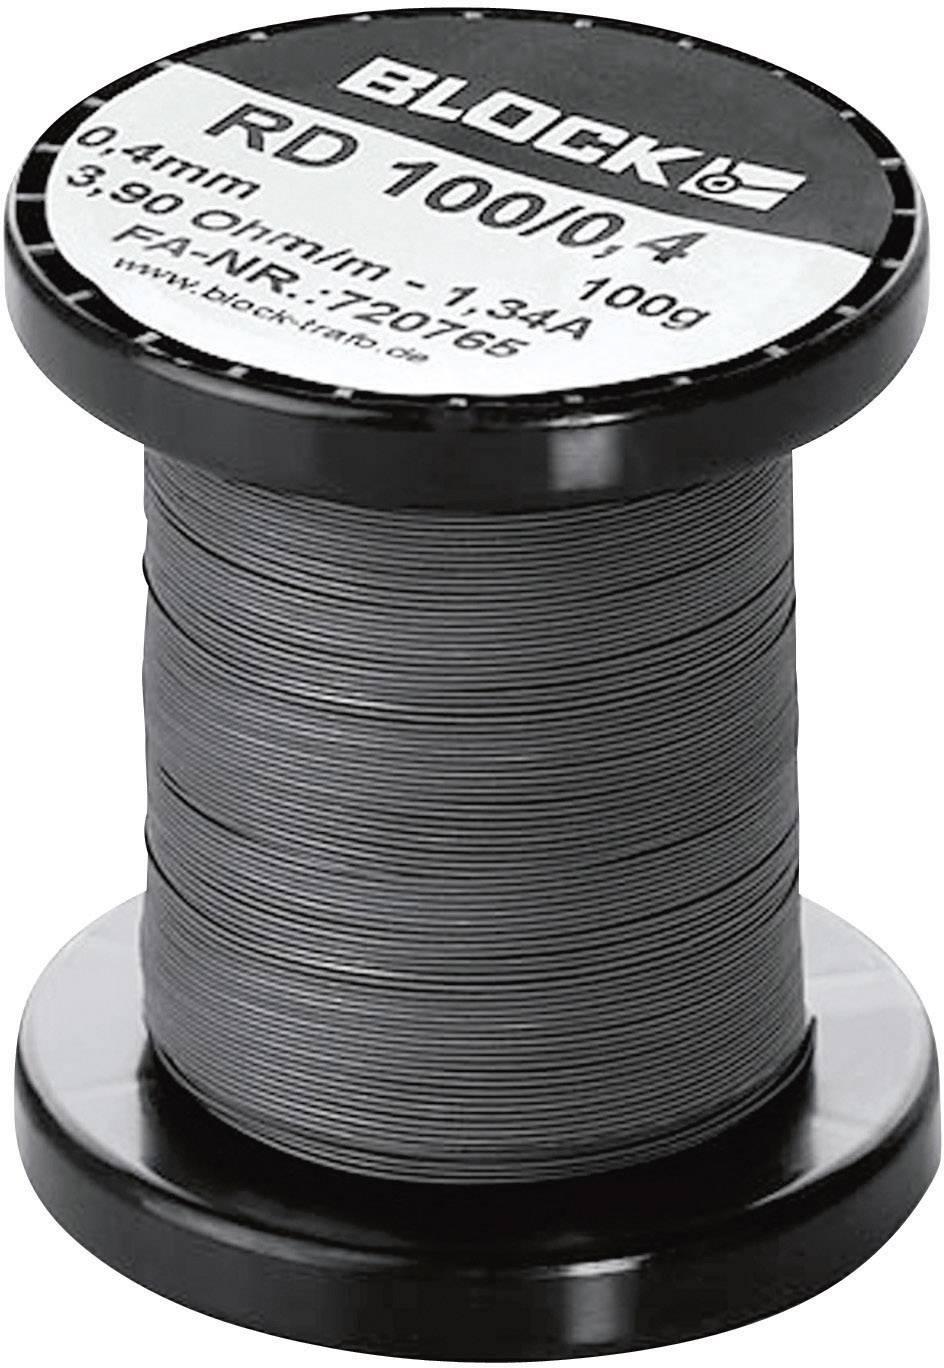 Odporový drát (konstantan) Block RD 100/1,0, 0.624 Ω/m, 14 m